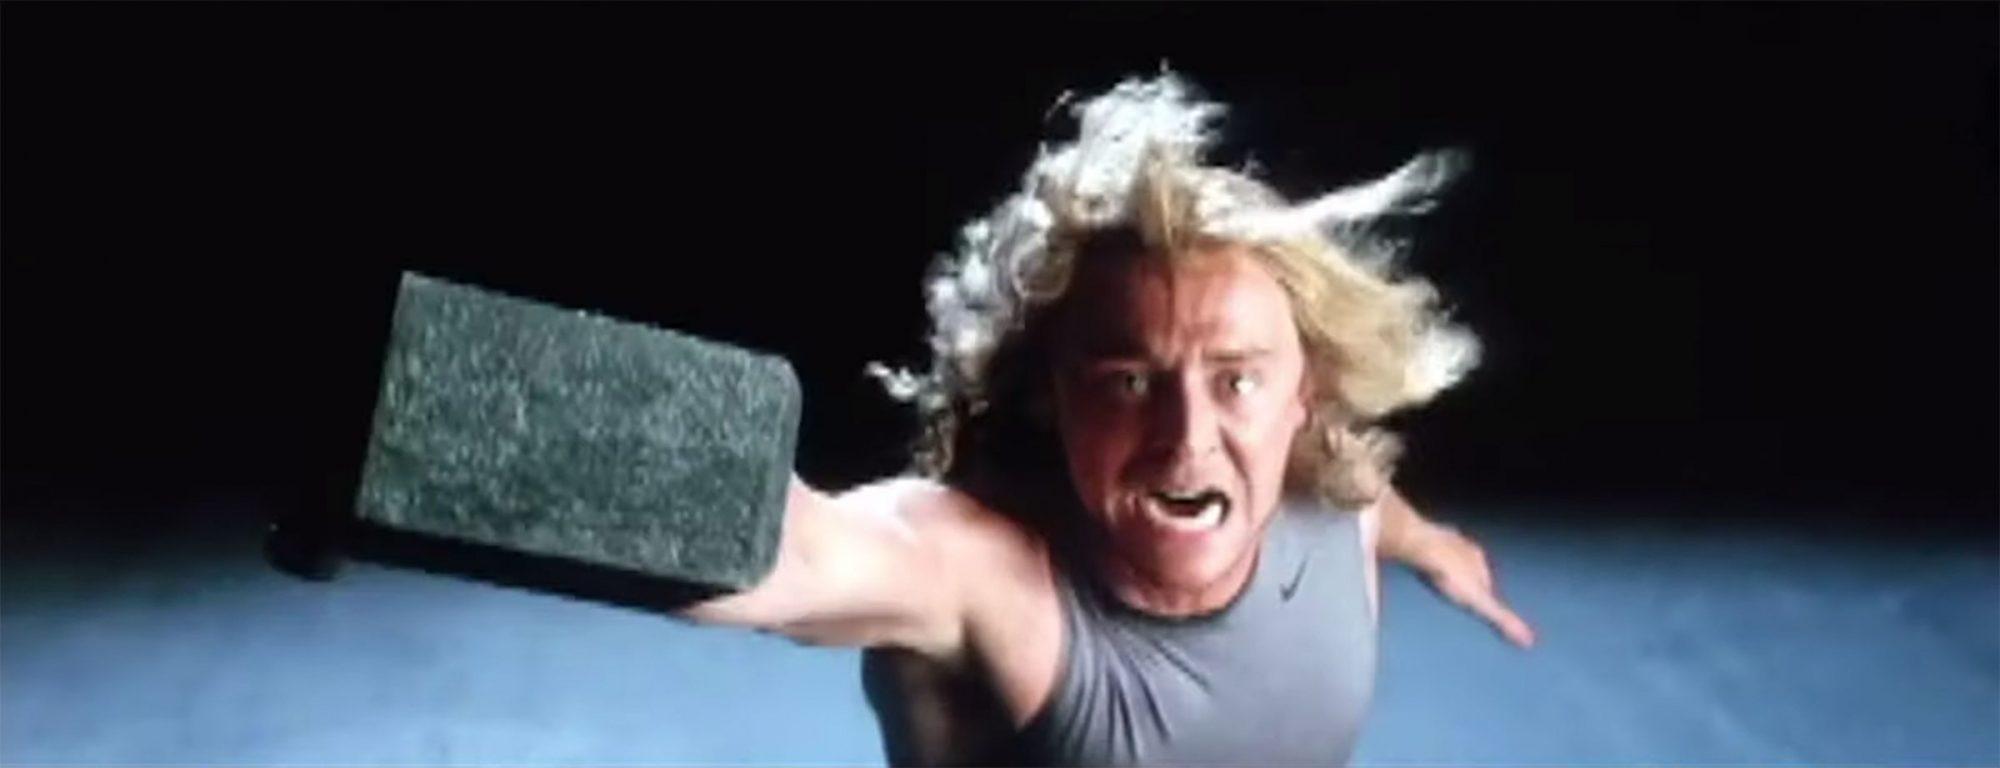 Tom Hiddleston Thor Audition screen grab